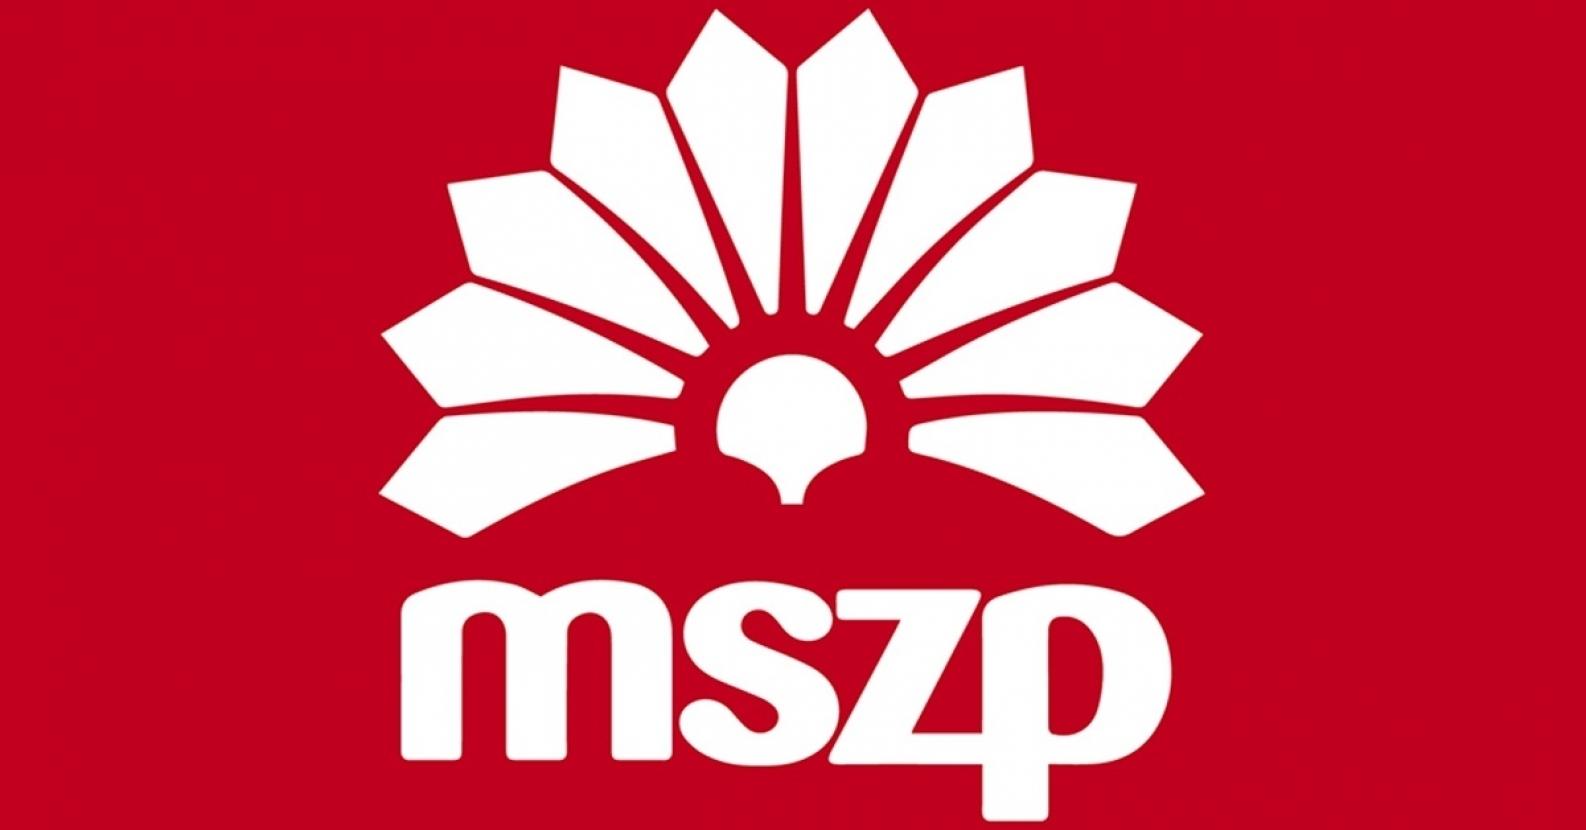 Platform meghívó! - mszp.hu